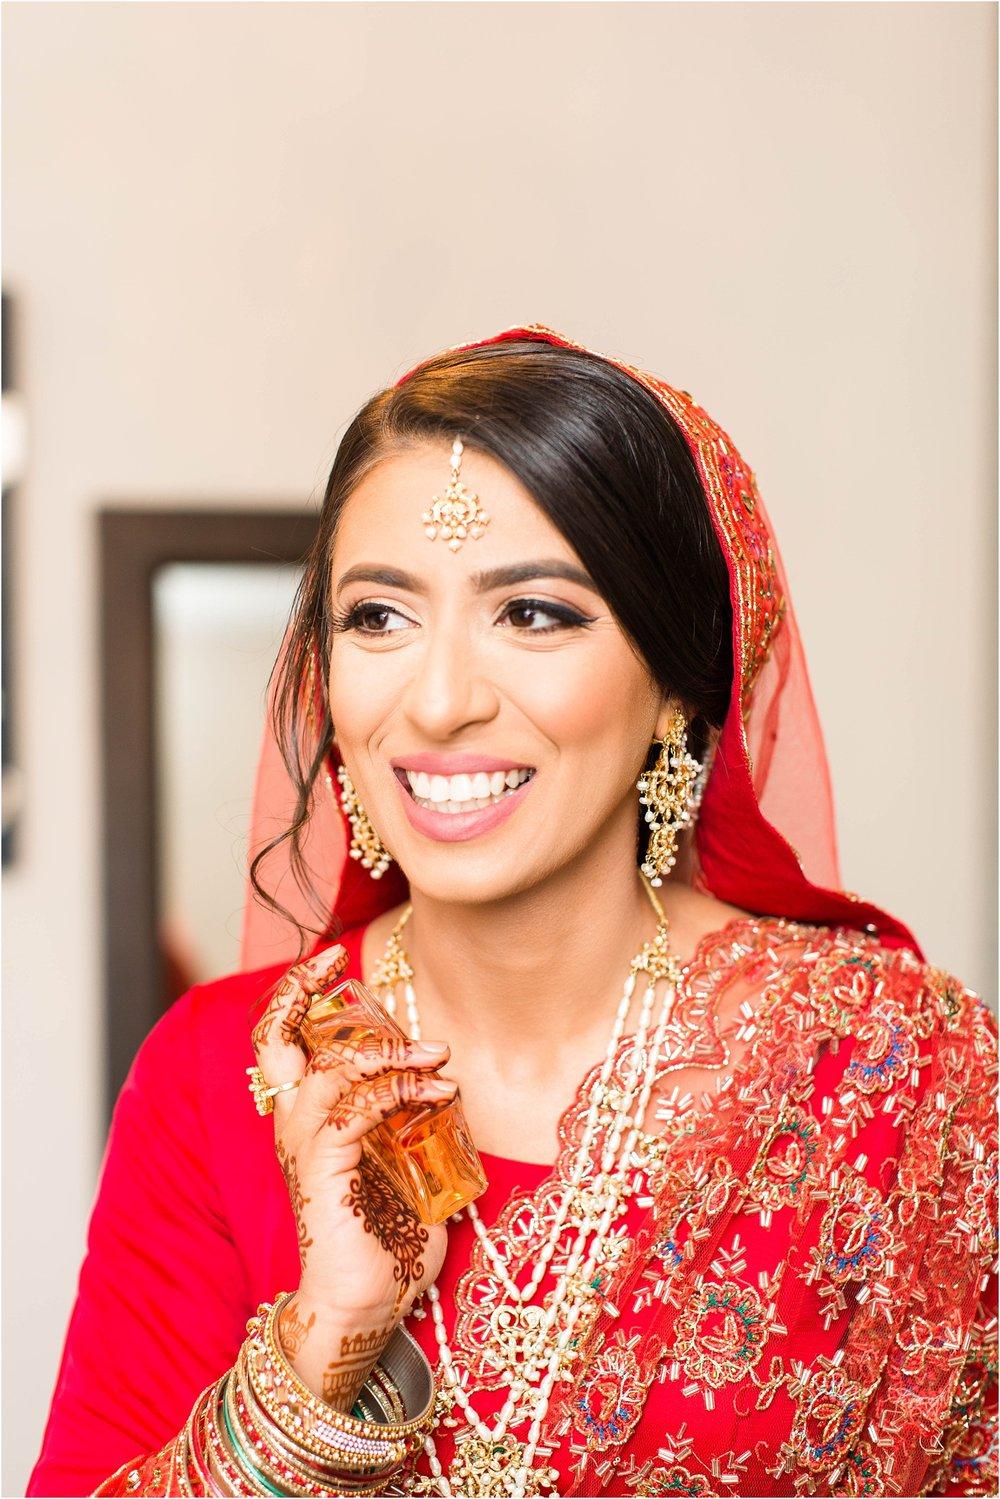 Jame-Masjid-Coopers-Mosque-Kariya-Park-Cherry-Blossoms-Wedding-Toronto-Mississauga-Brampton-Scarborough-GTA-Pakistani-Indian-Wedding-Engagement-Photographer-Photography_0009.jpg